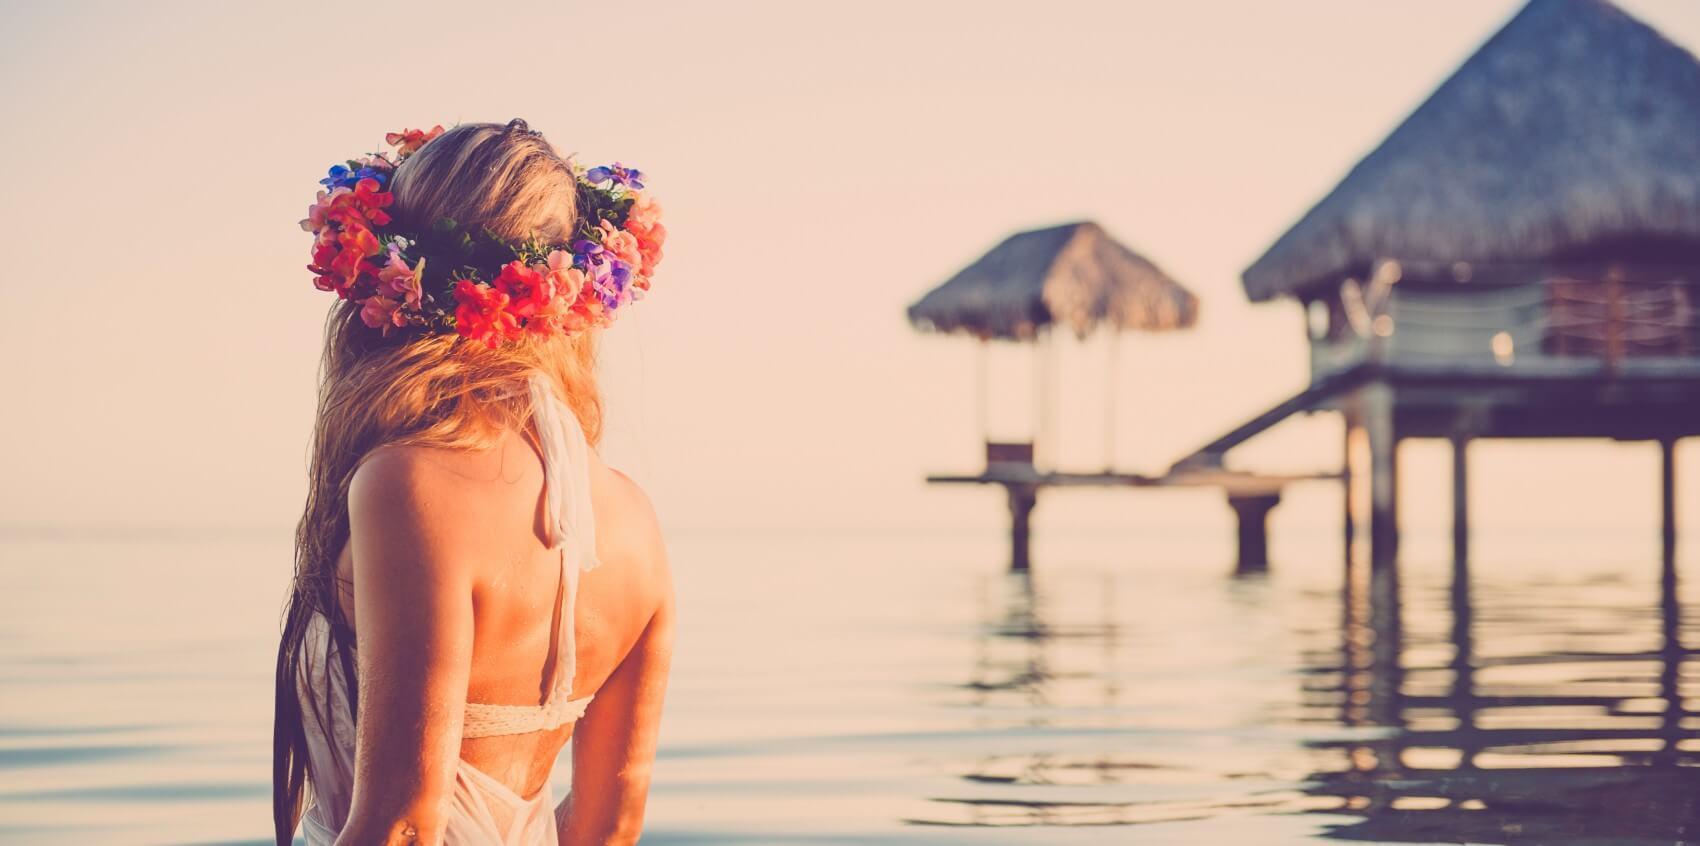 marc-gerard-photographe-mariage-montpellier-reportage-mode-tahiti-5